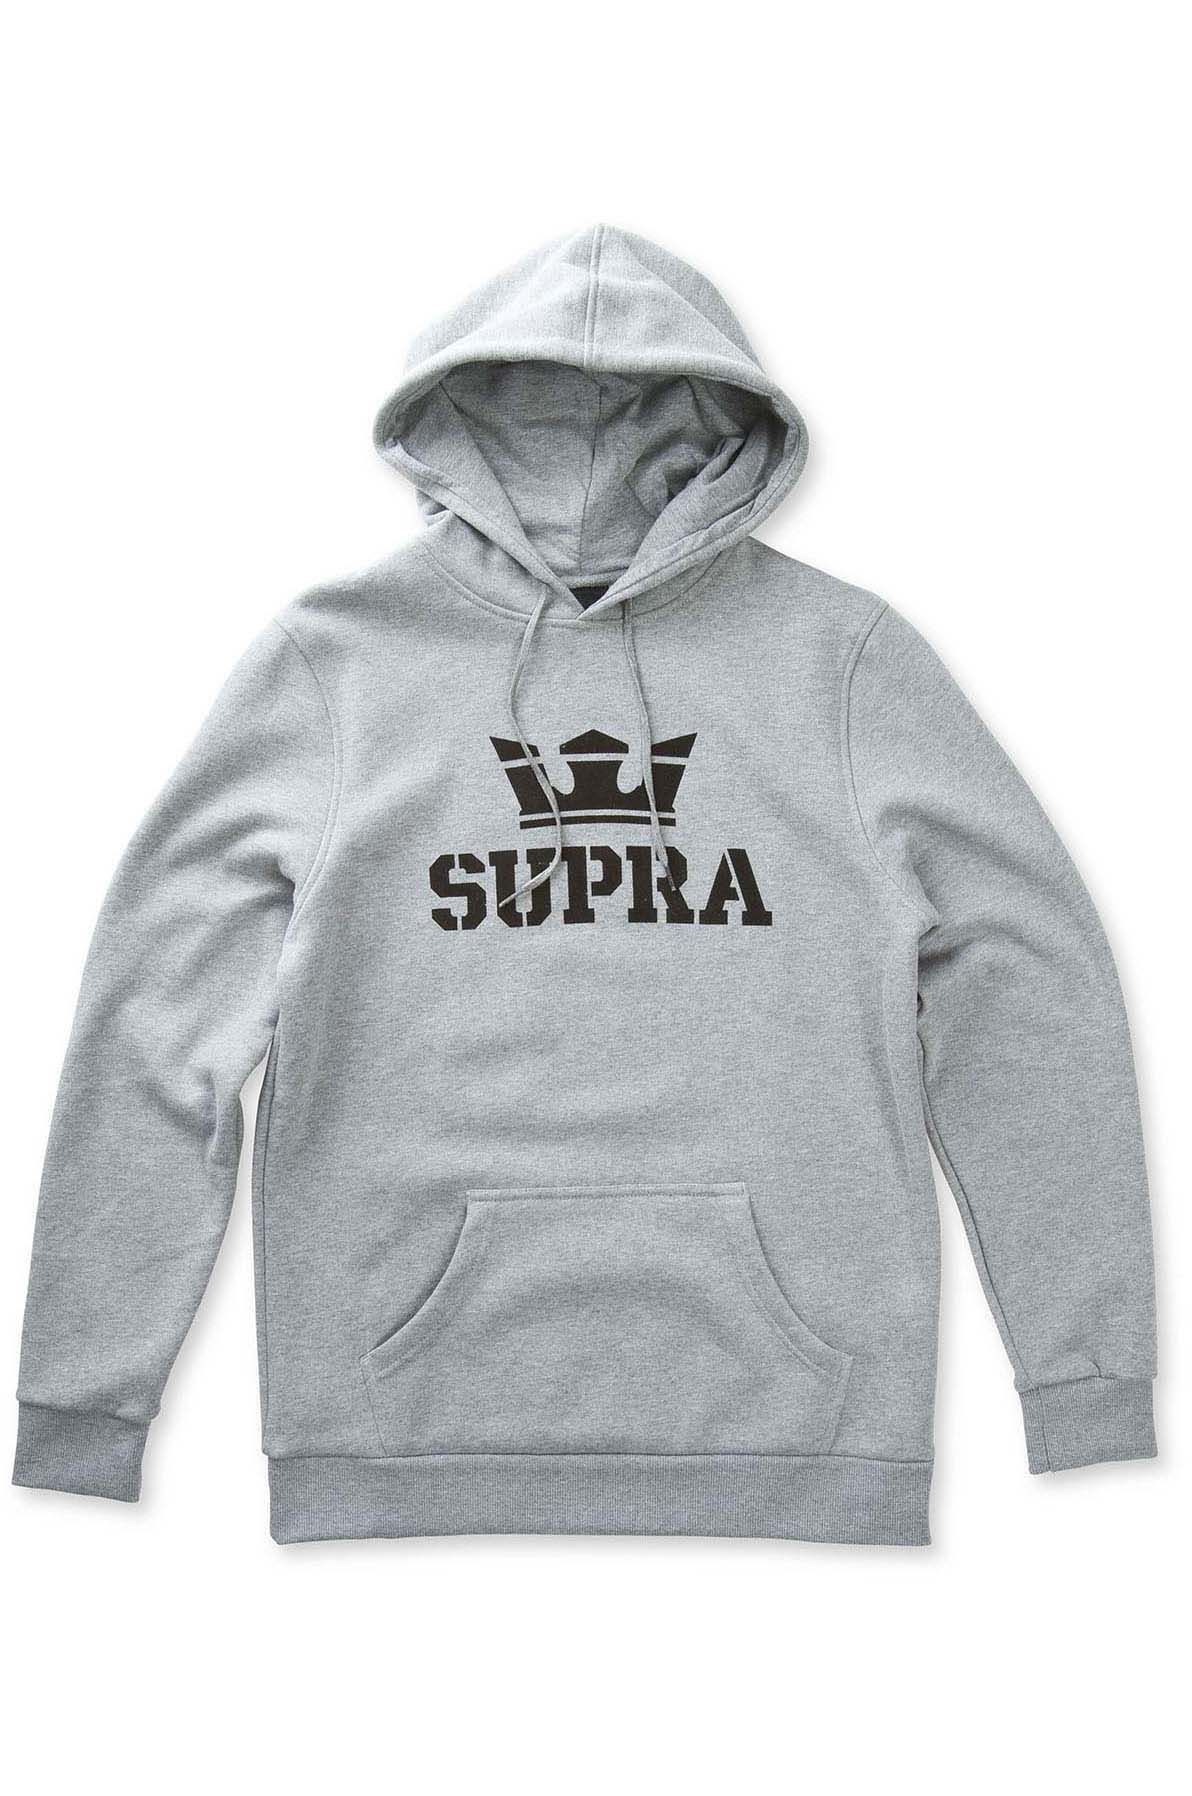 Supra Sweat Hood ABOVE Grey Heather/Black/Black